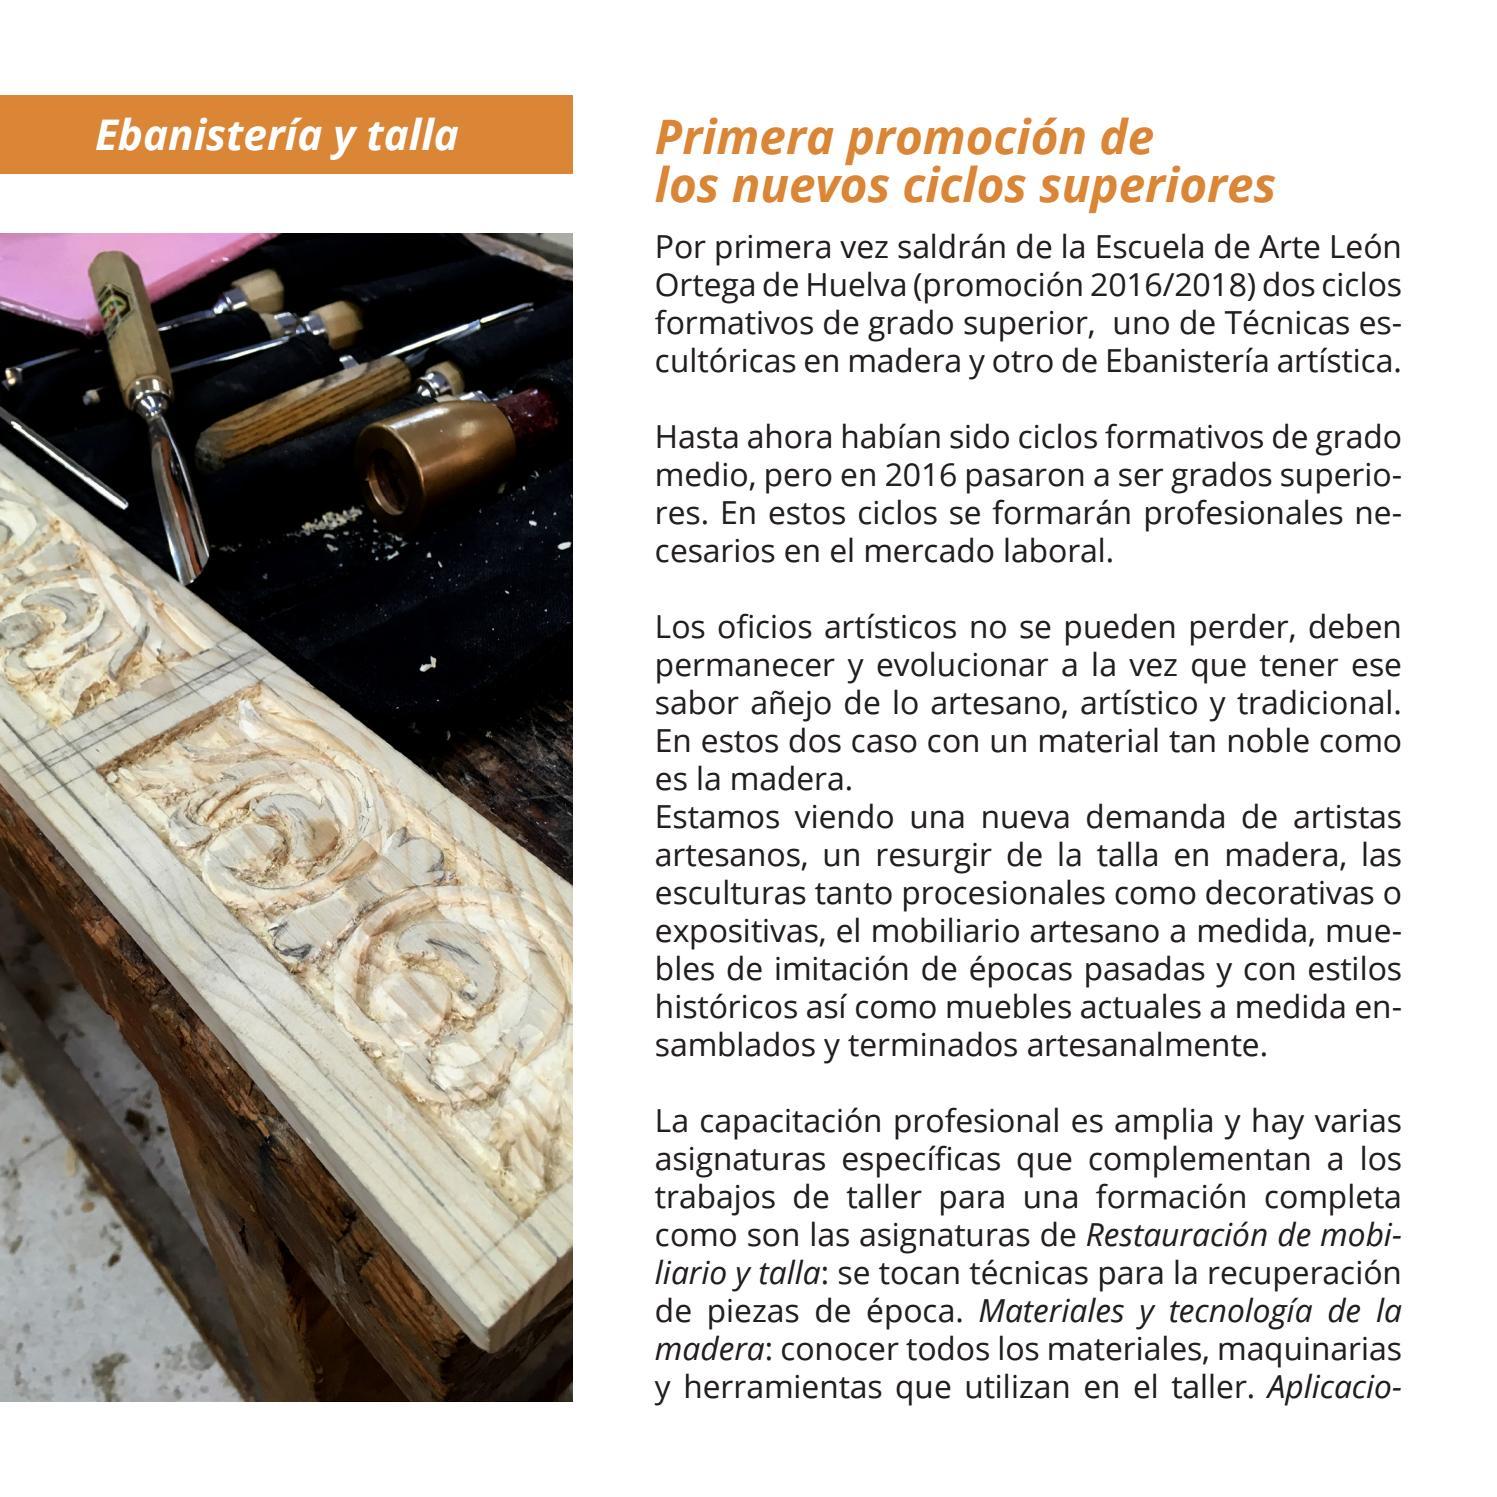 Revista Matadero 17 By Escuela De Arte León Ortega De Huelva